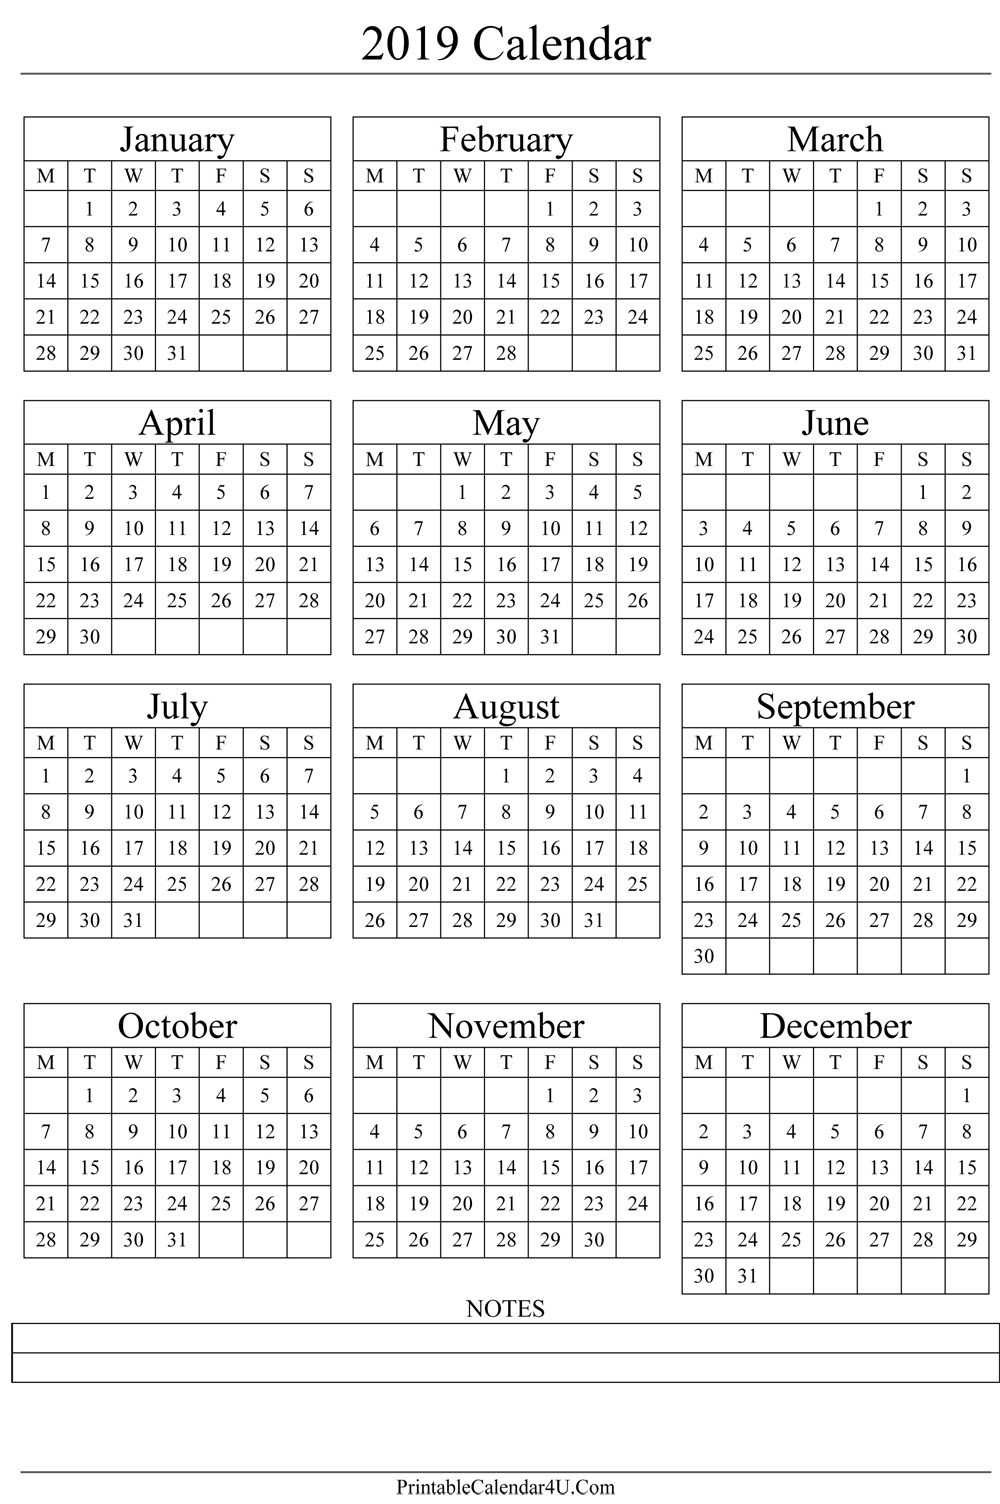 Annual Calendar 2019 Portrait Printable Calendar 2017 2018 2019 with regard to Printable Yearly Calendar With Lines